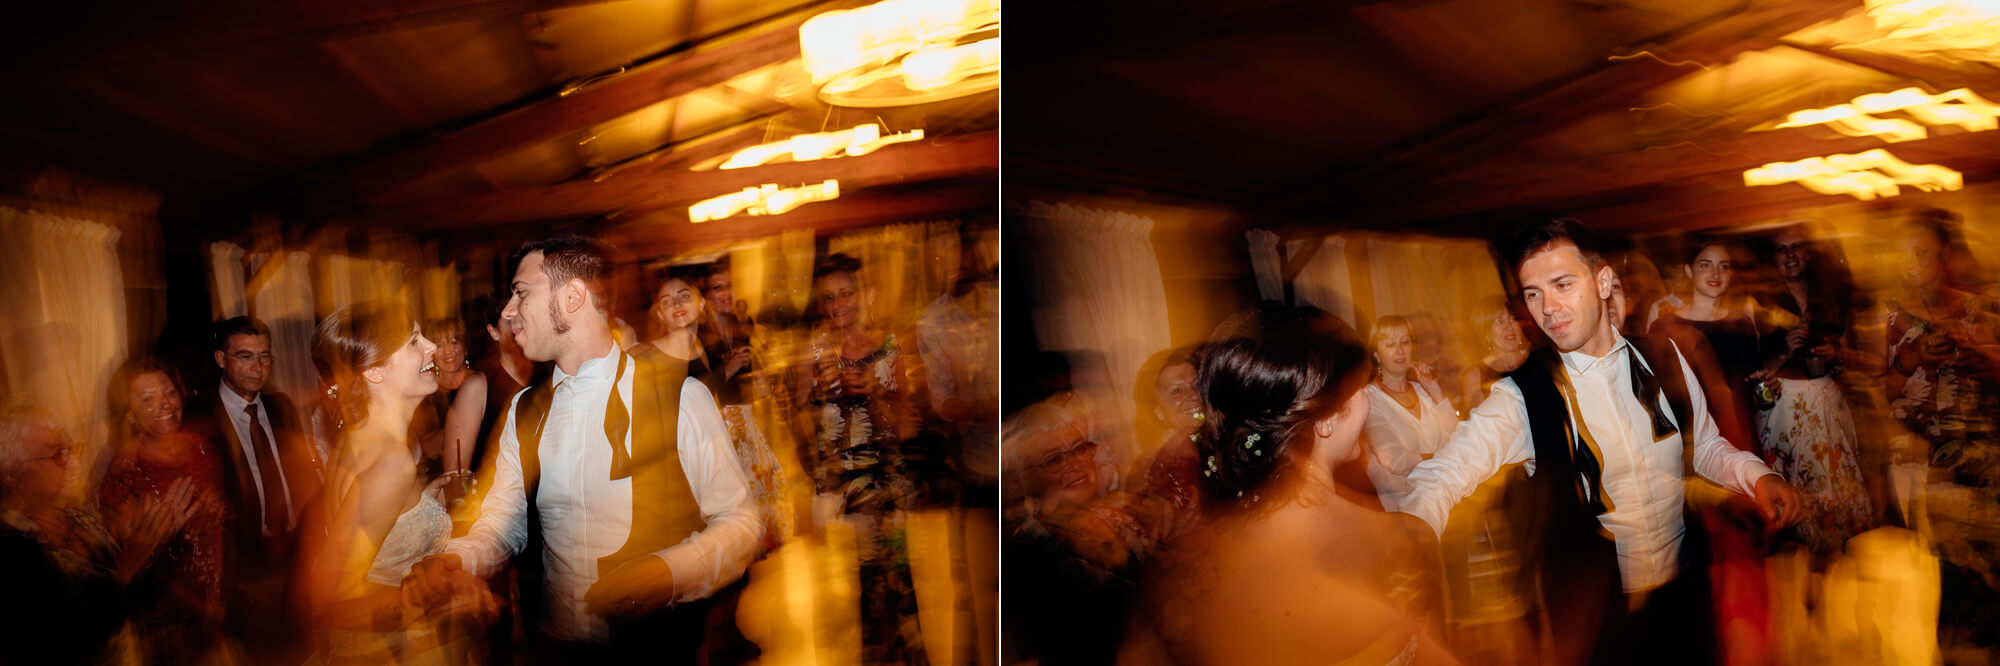 114-arezzo-wedding-photographer.jpg